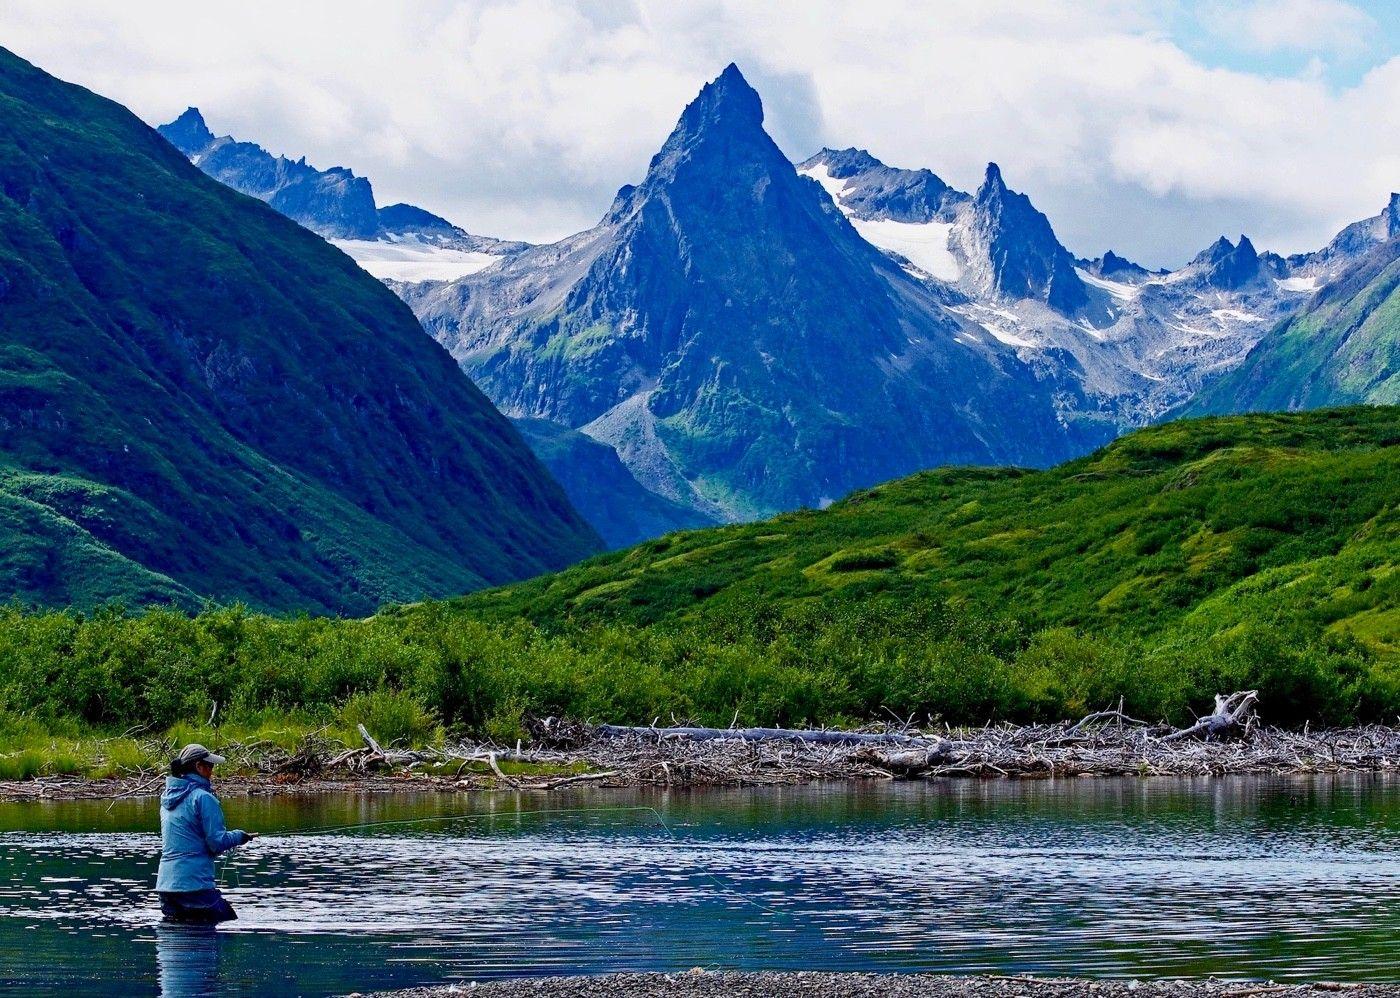 You'll fish in splendor.